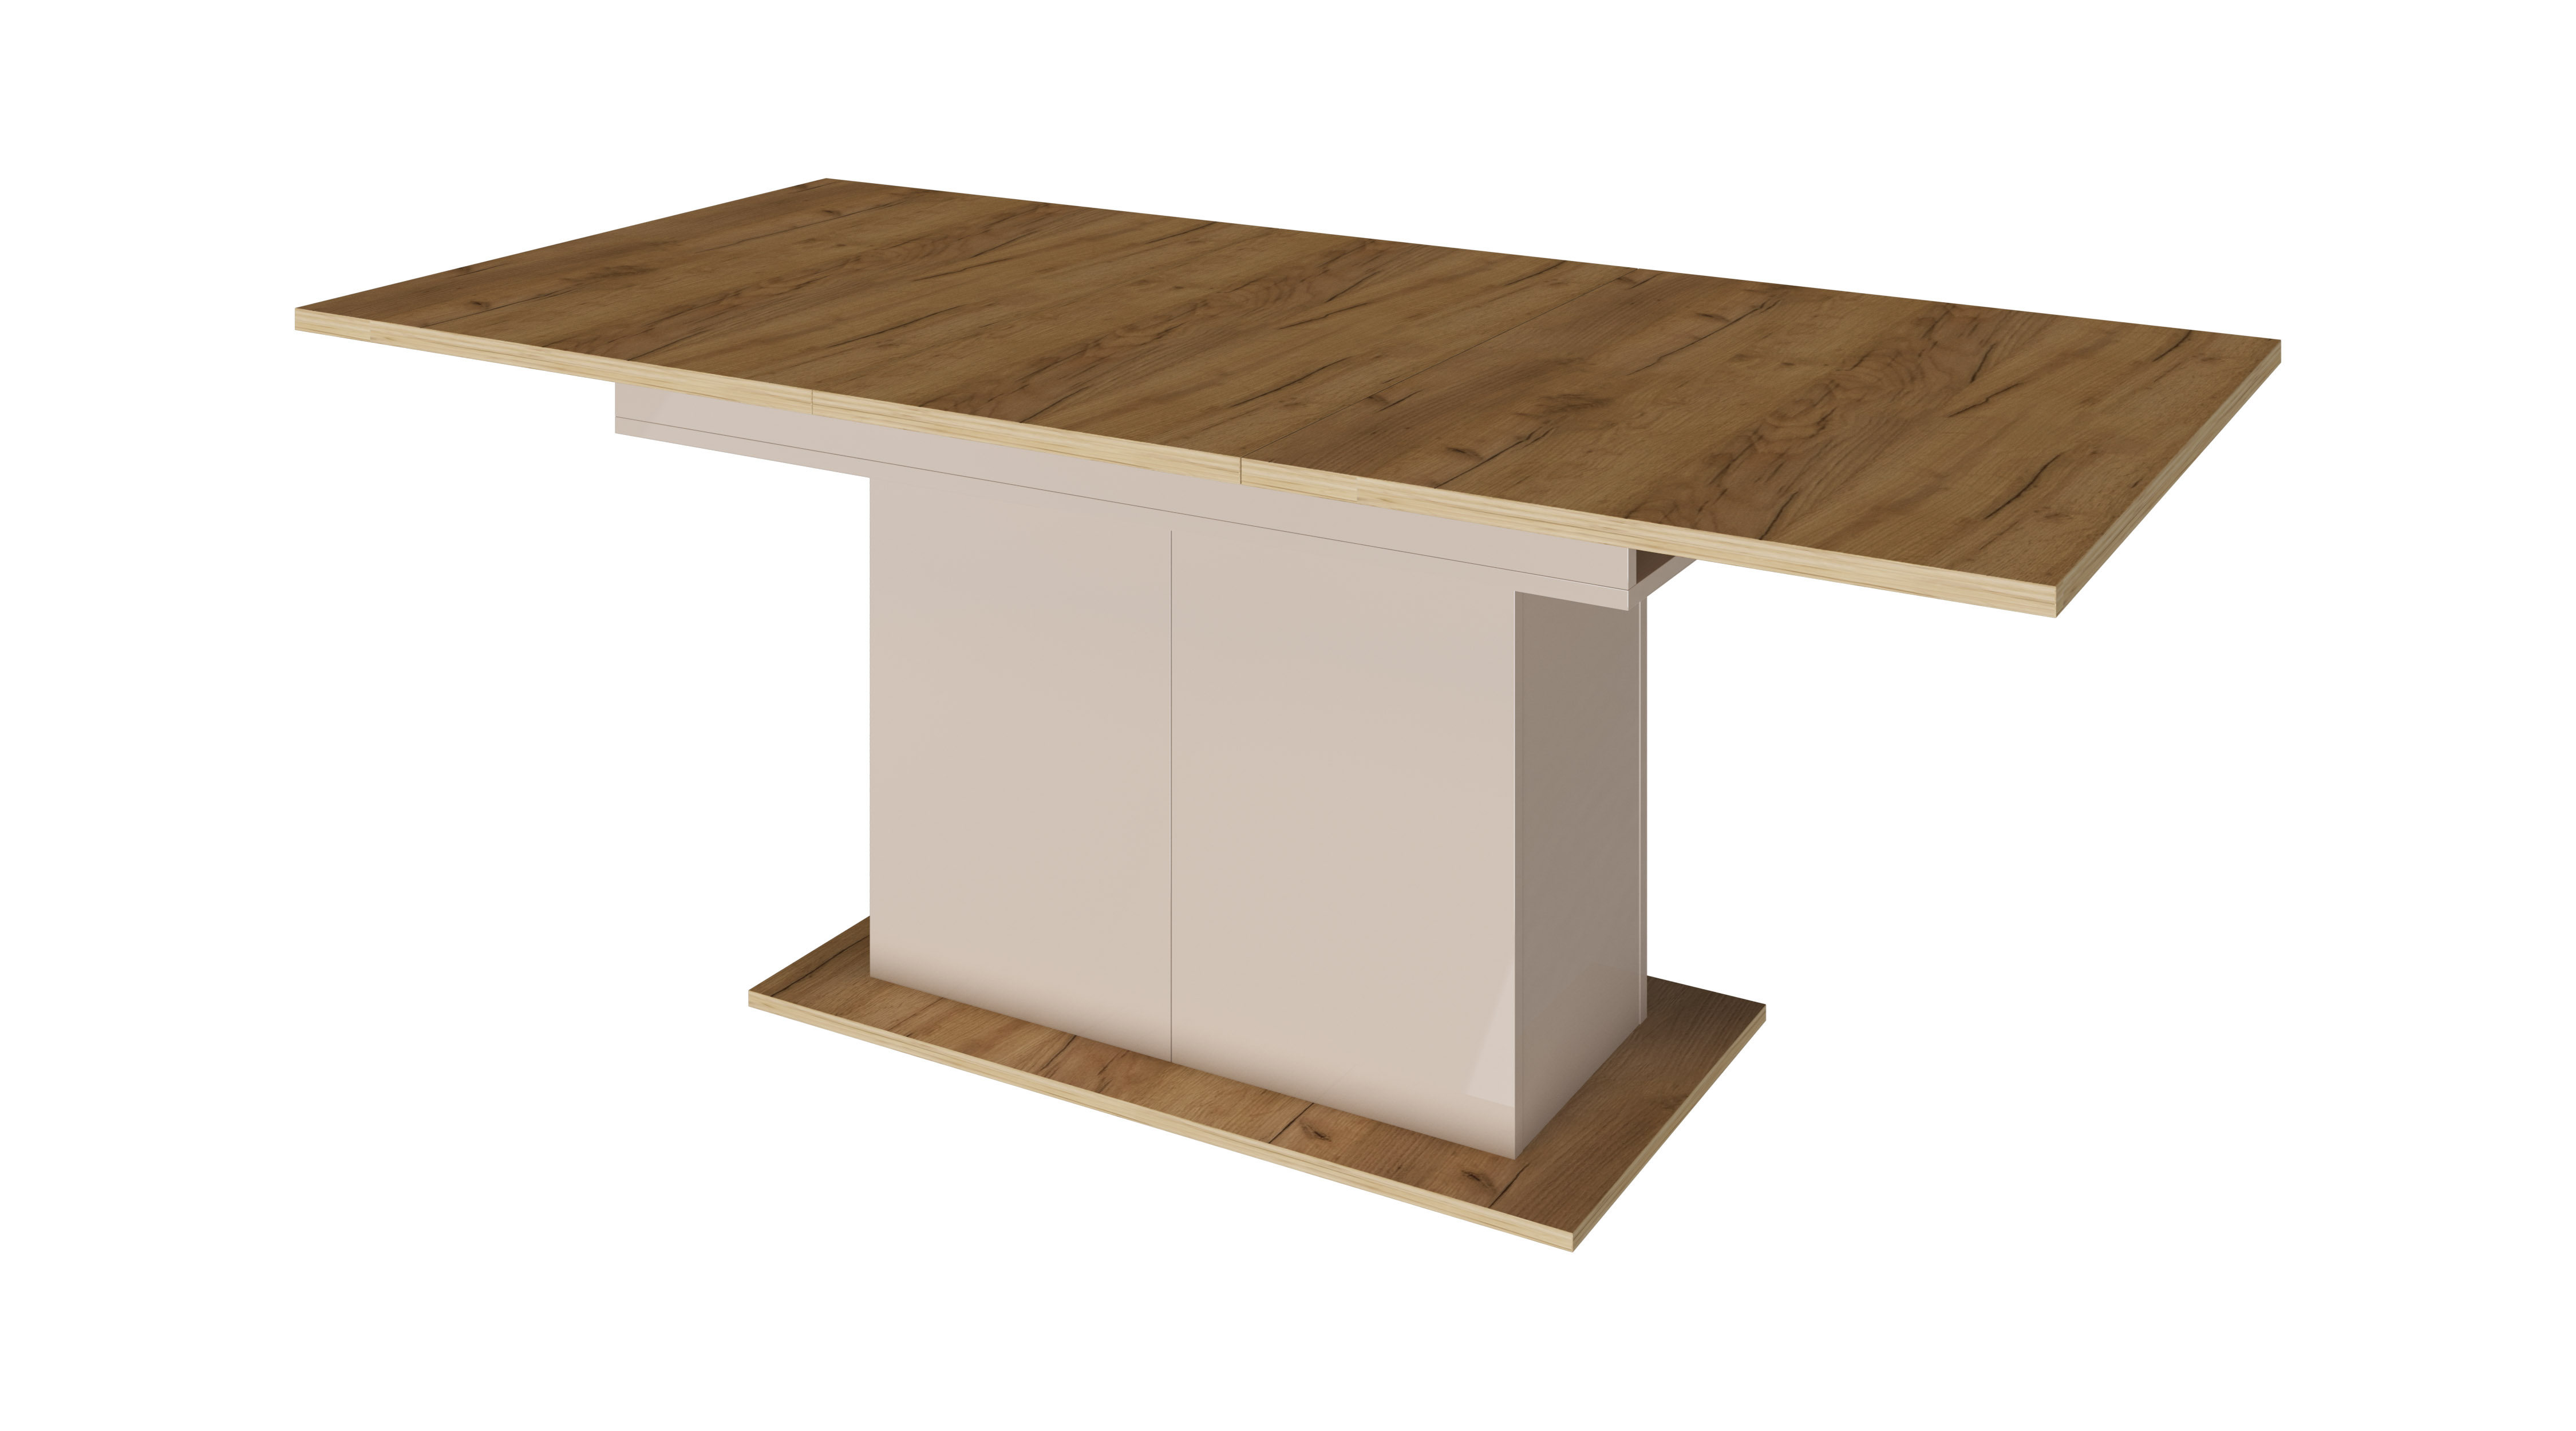 Стол обеденный дуб крафт/капучино глянец - фото